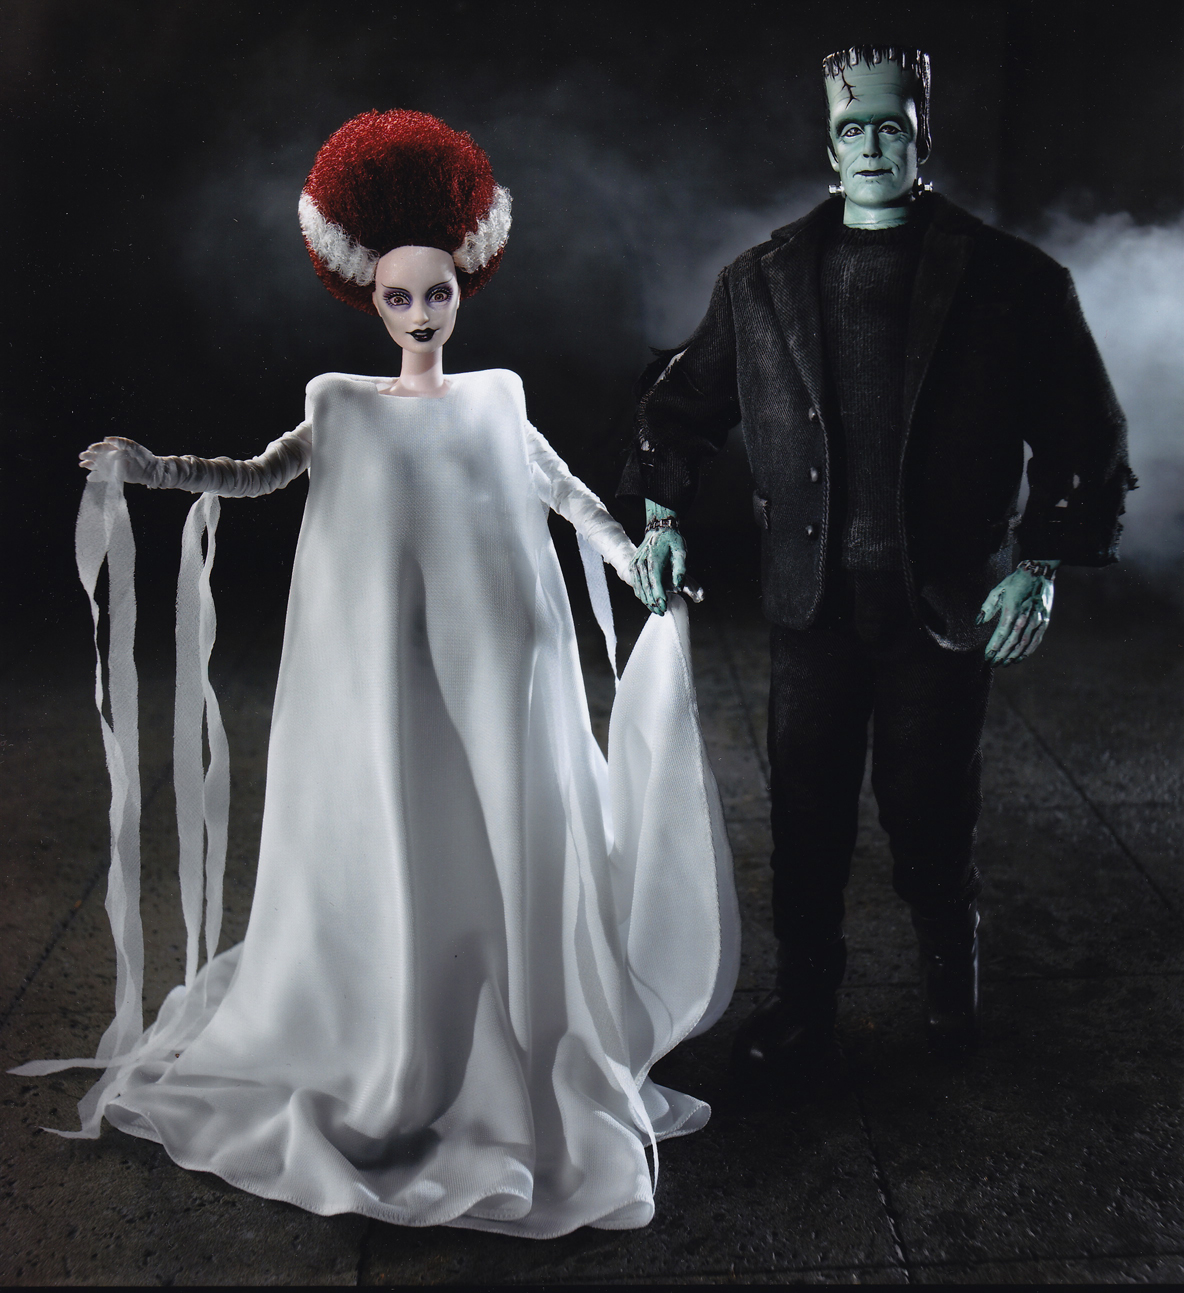 Bride of Frankenstein One-of-a-Kind Barbie Doll